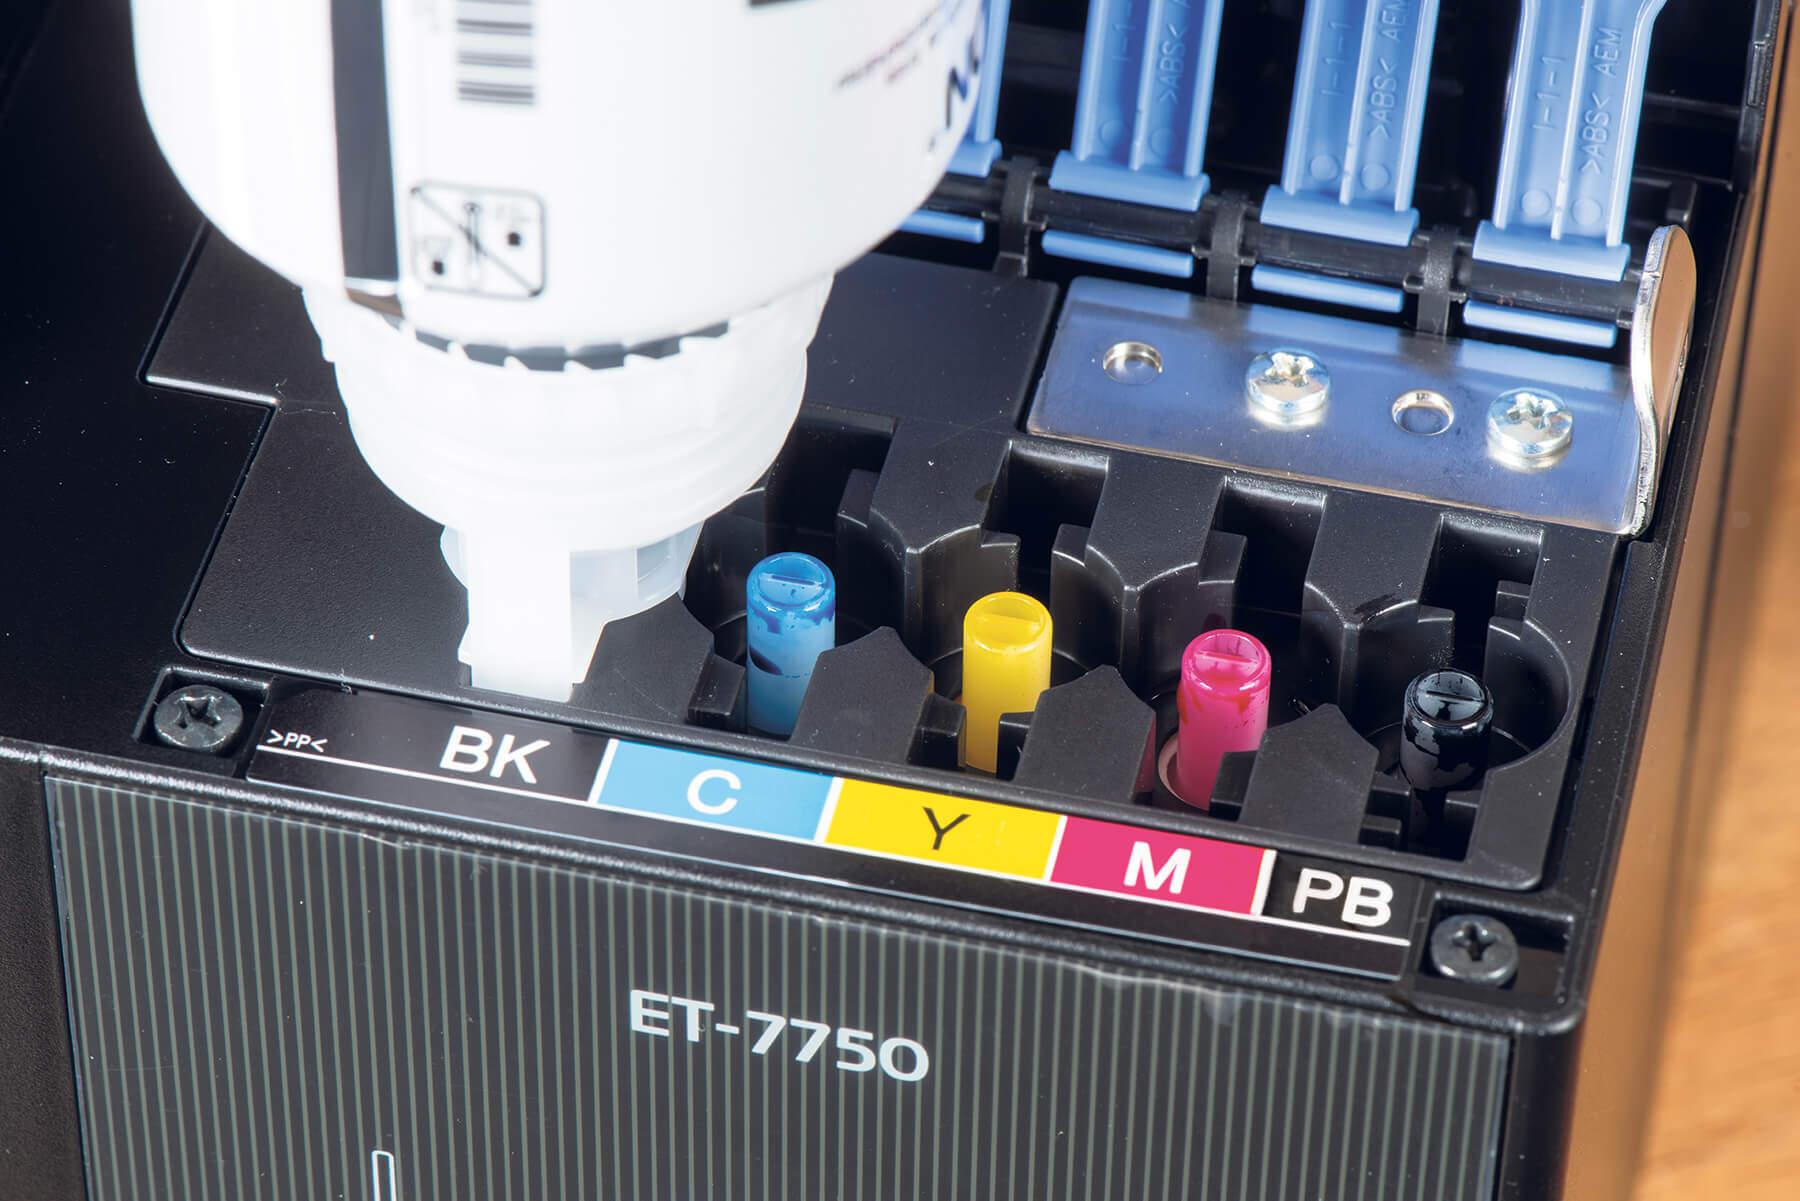 Epson EcoTank ET-7750 refill